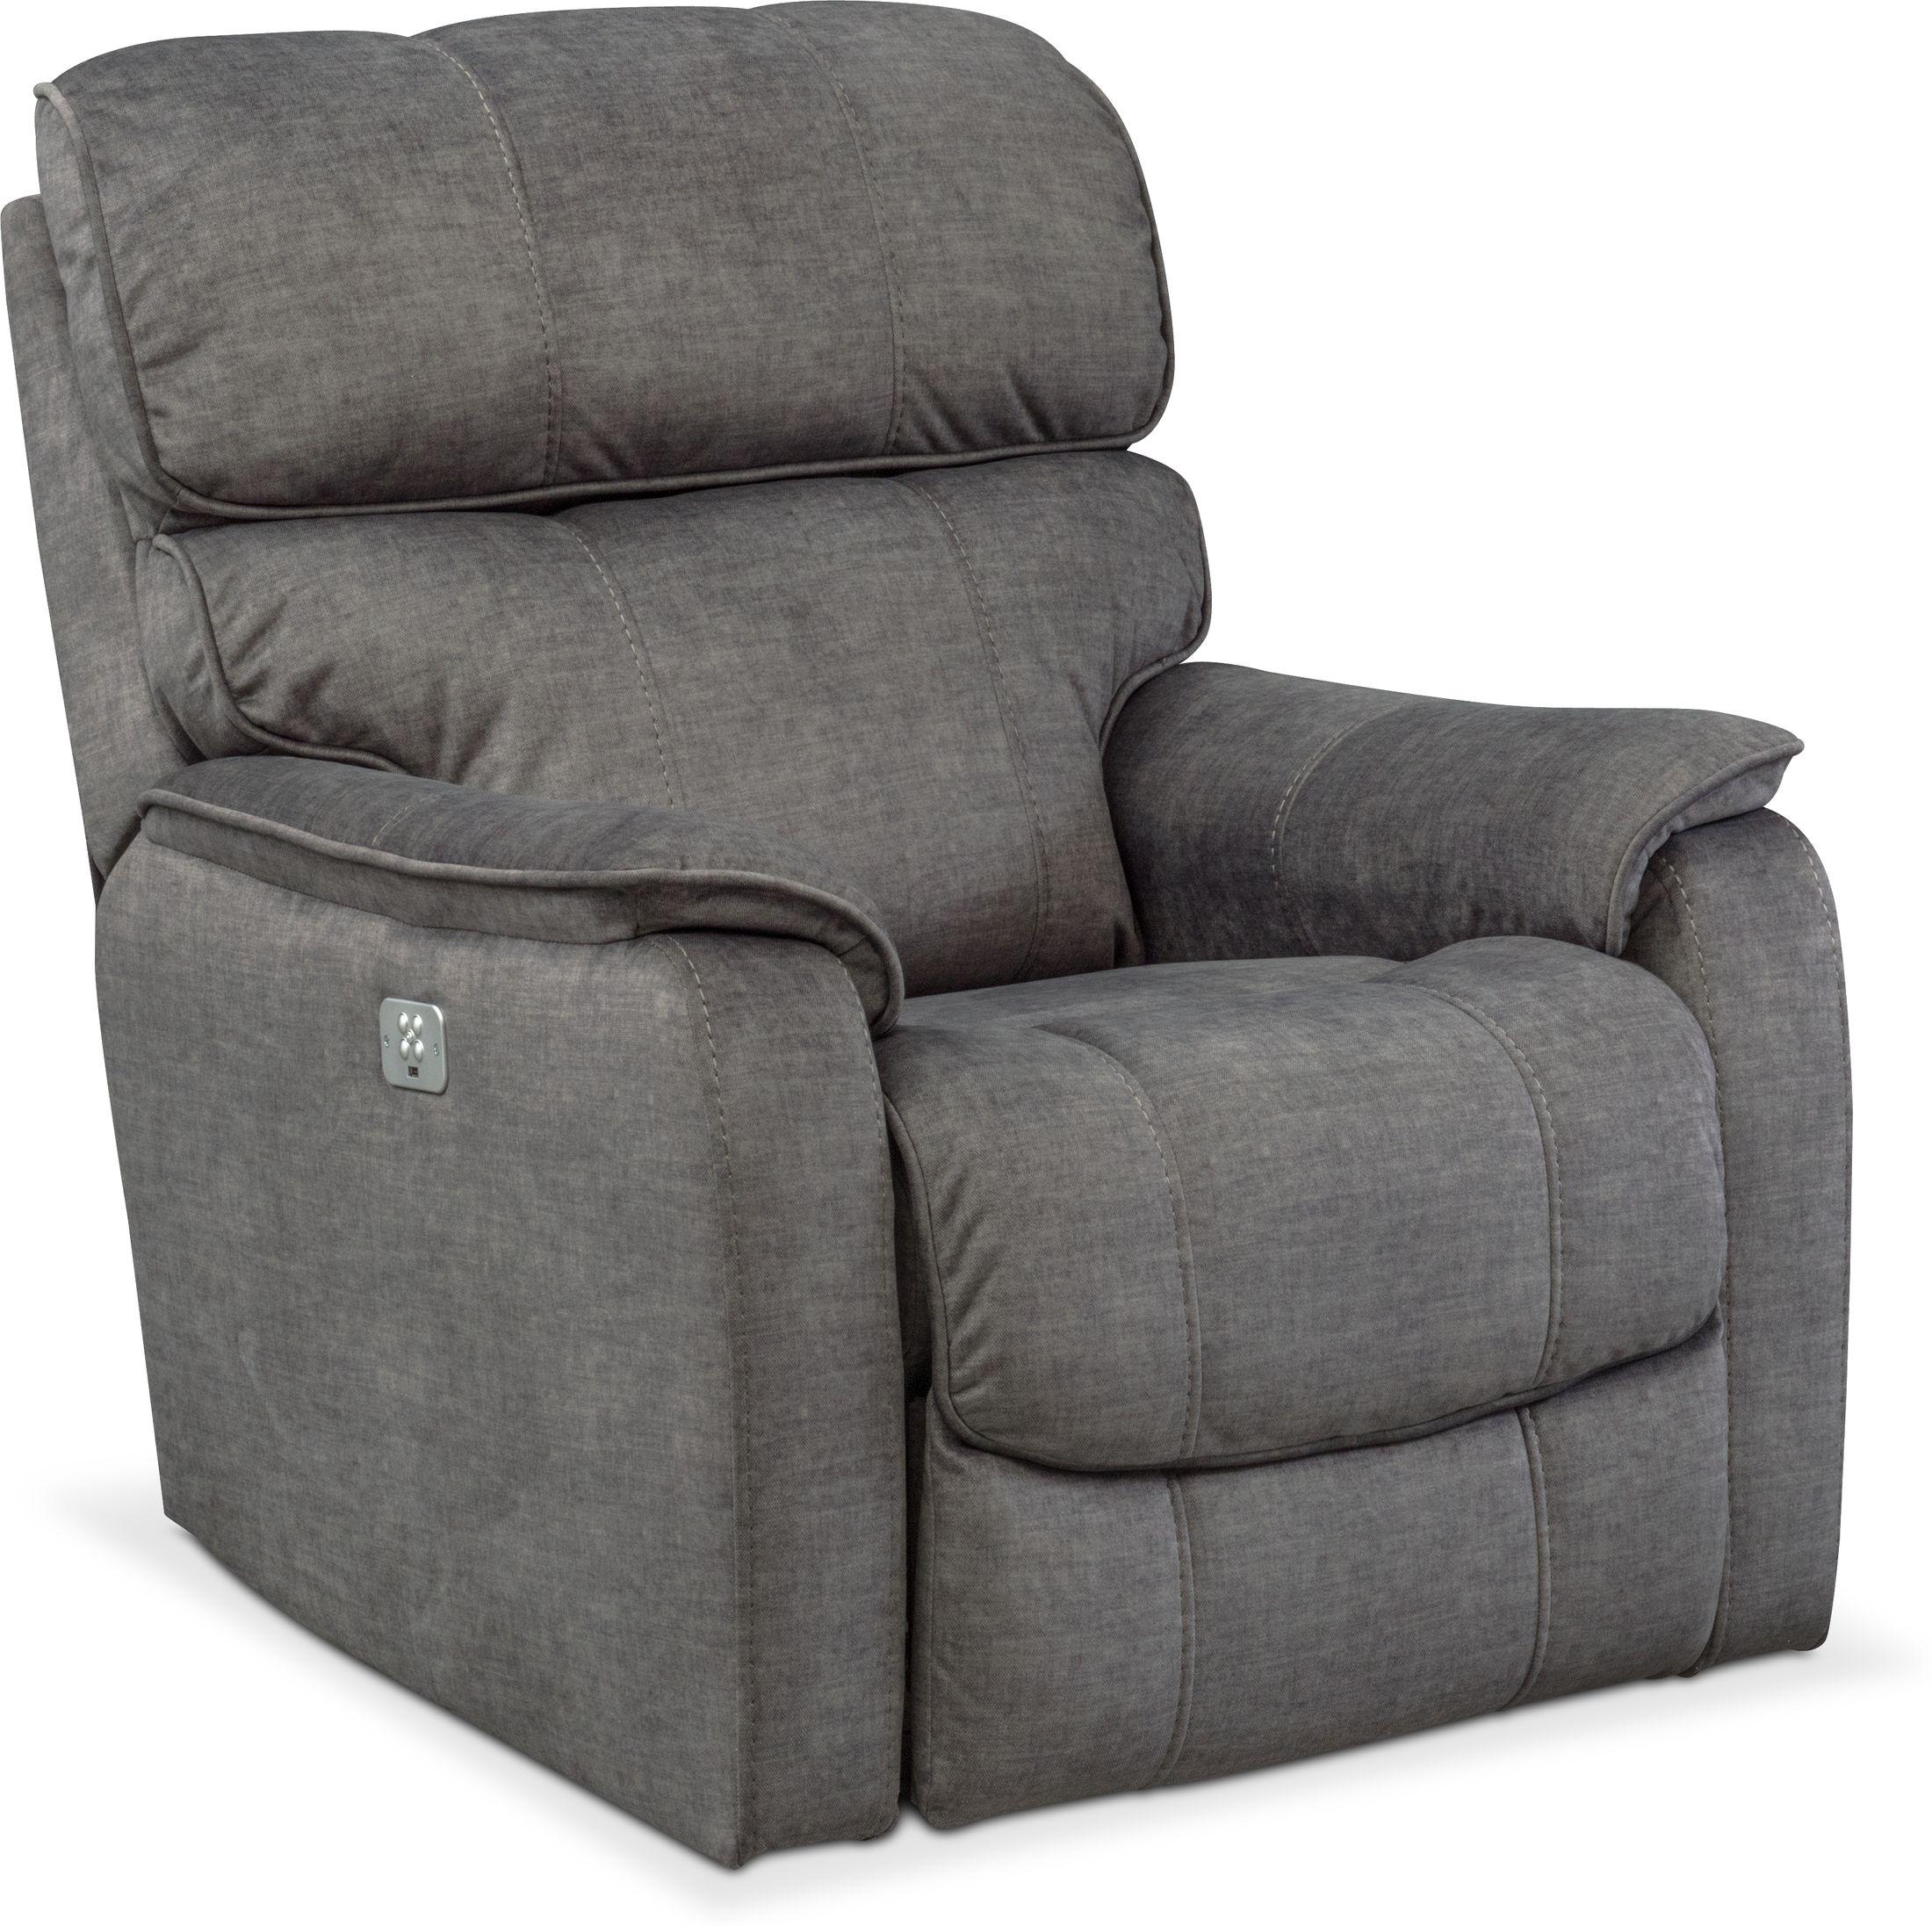 Living Room Furniture - Mondo Dual-Power Recliner